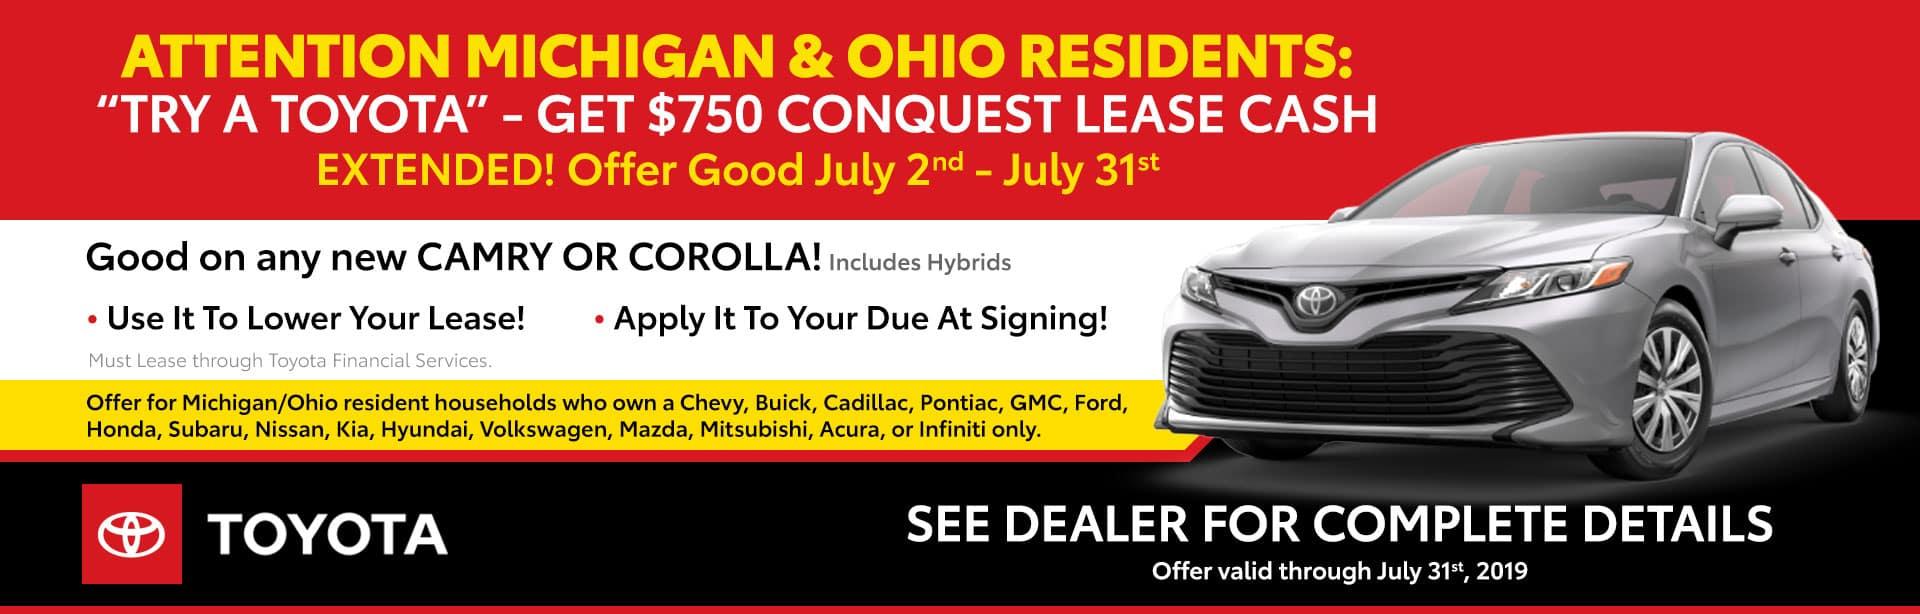 Toyota Dealership Dayton Ohio >> New Used Toyota Dealership In Columbus Ohio Germain Toyota